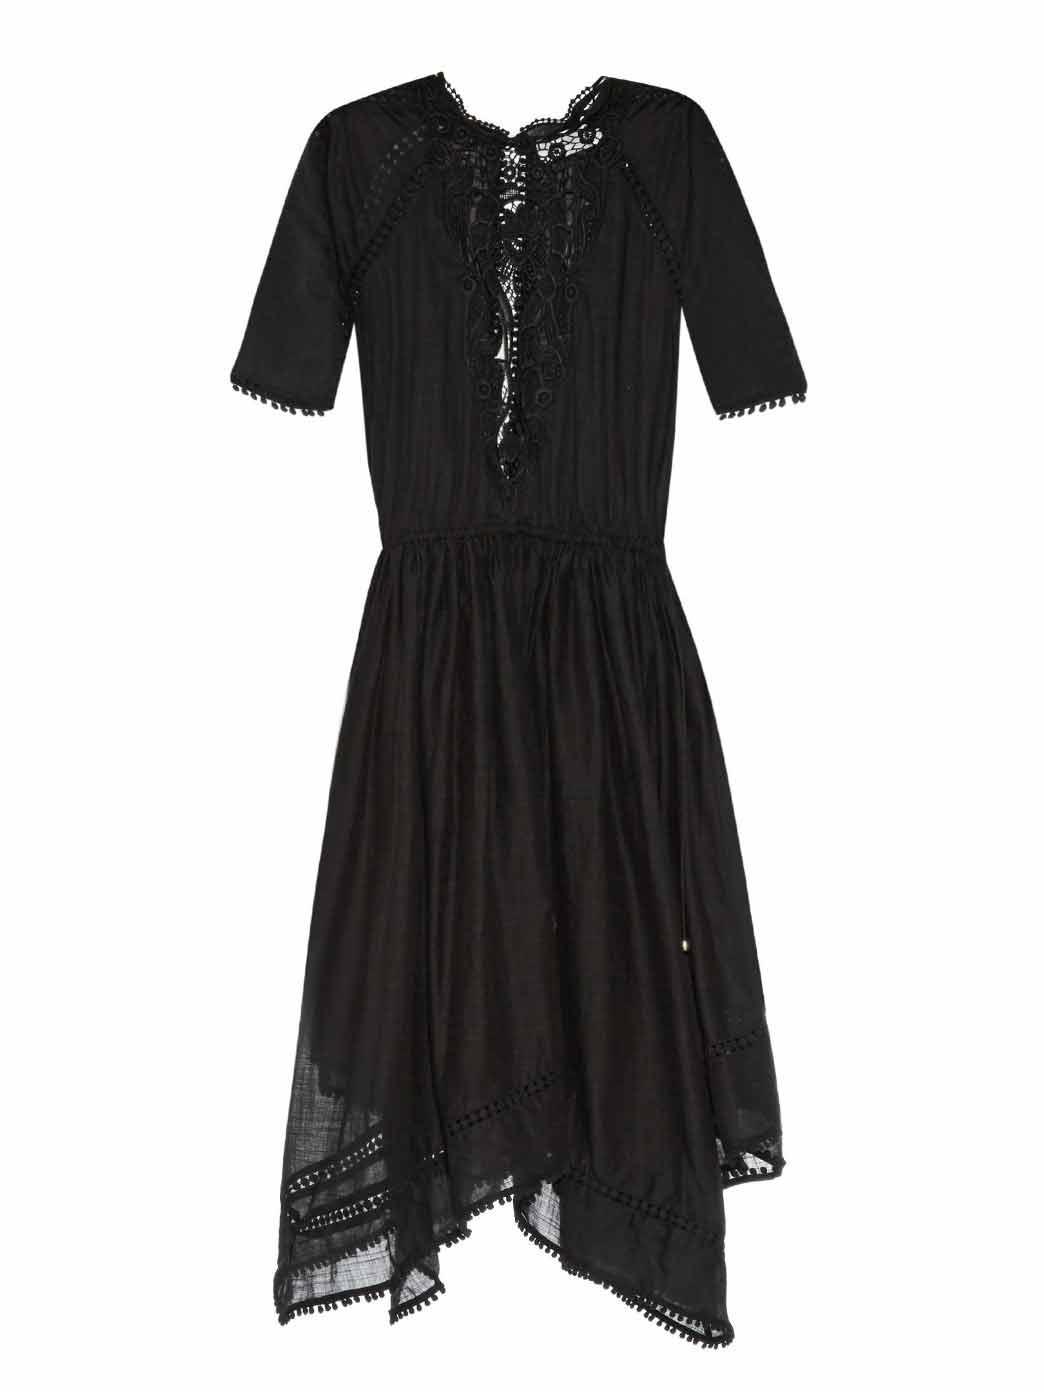 Nightmarch Motif cotton dress, £417, Zimmermann. www.matchesfashion.com